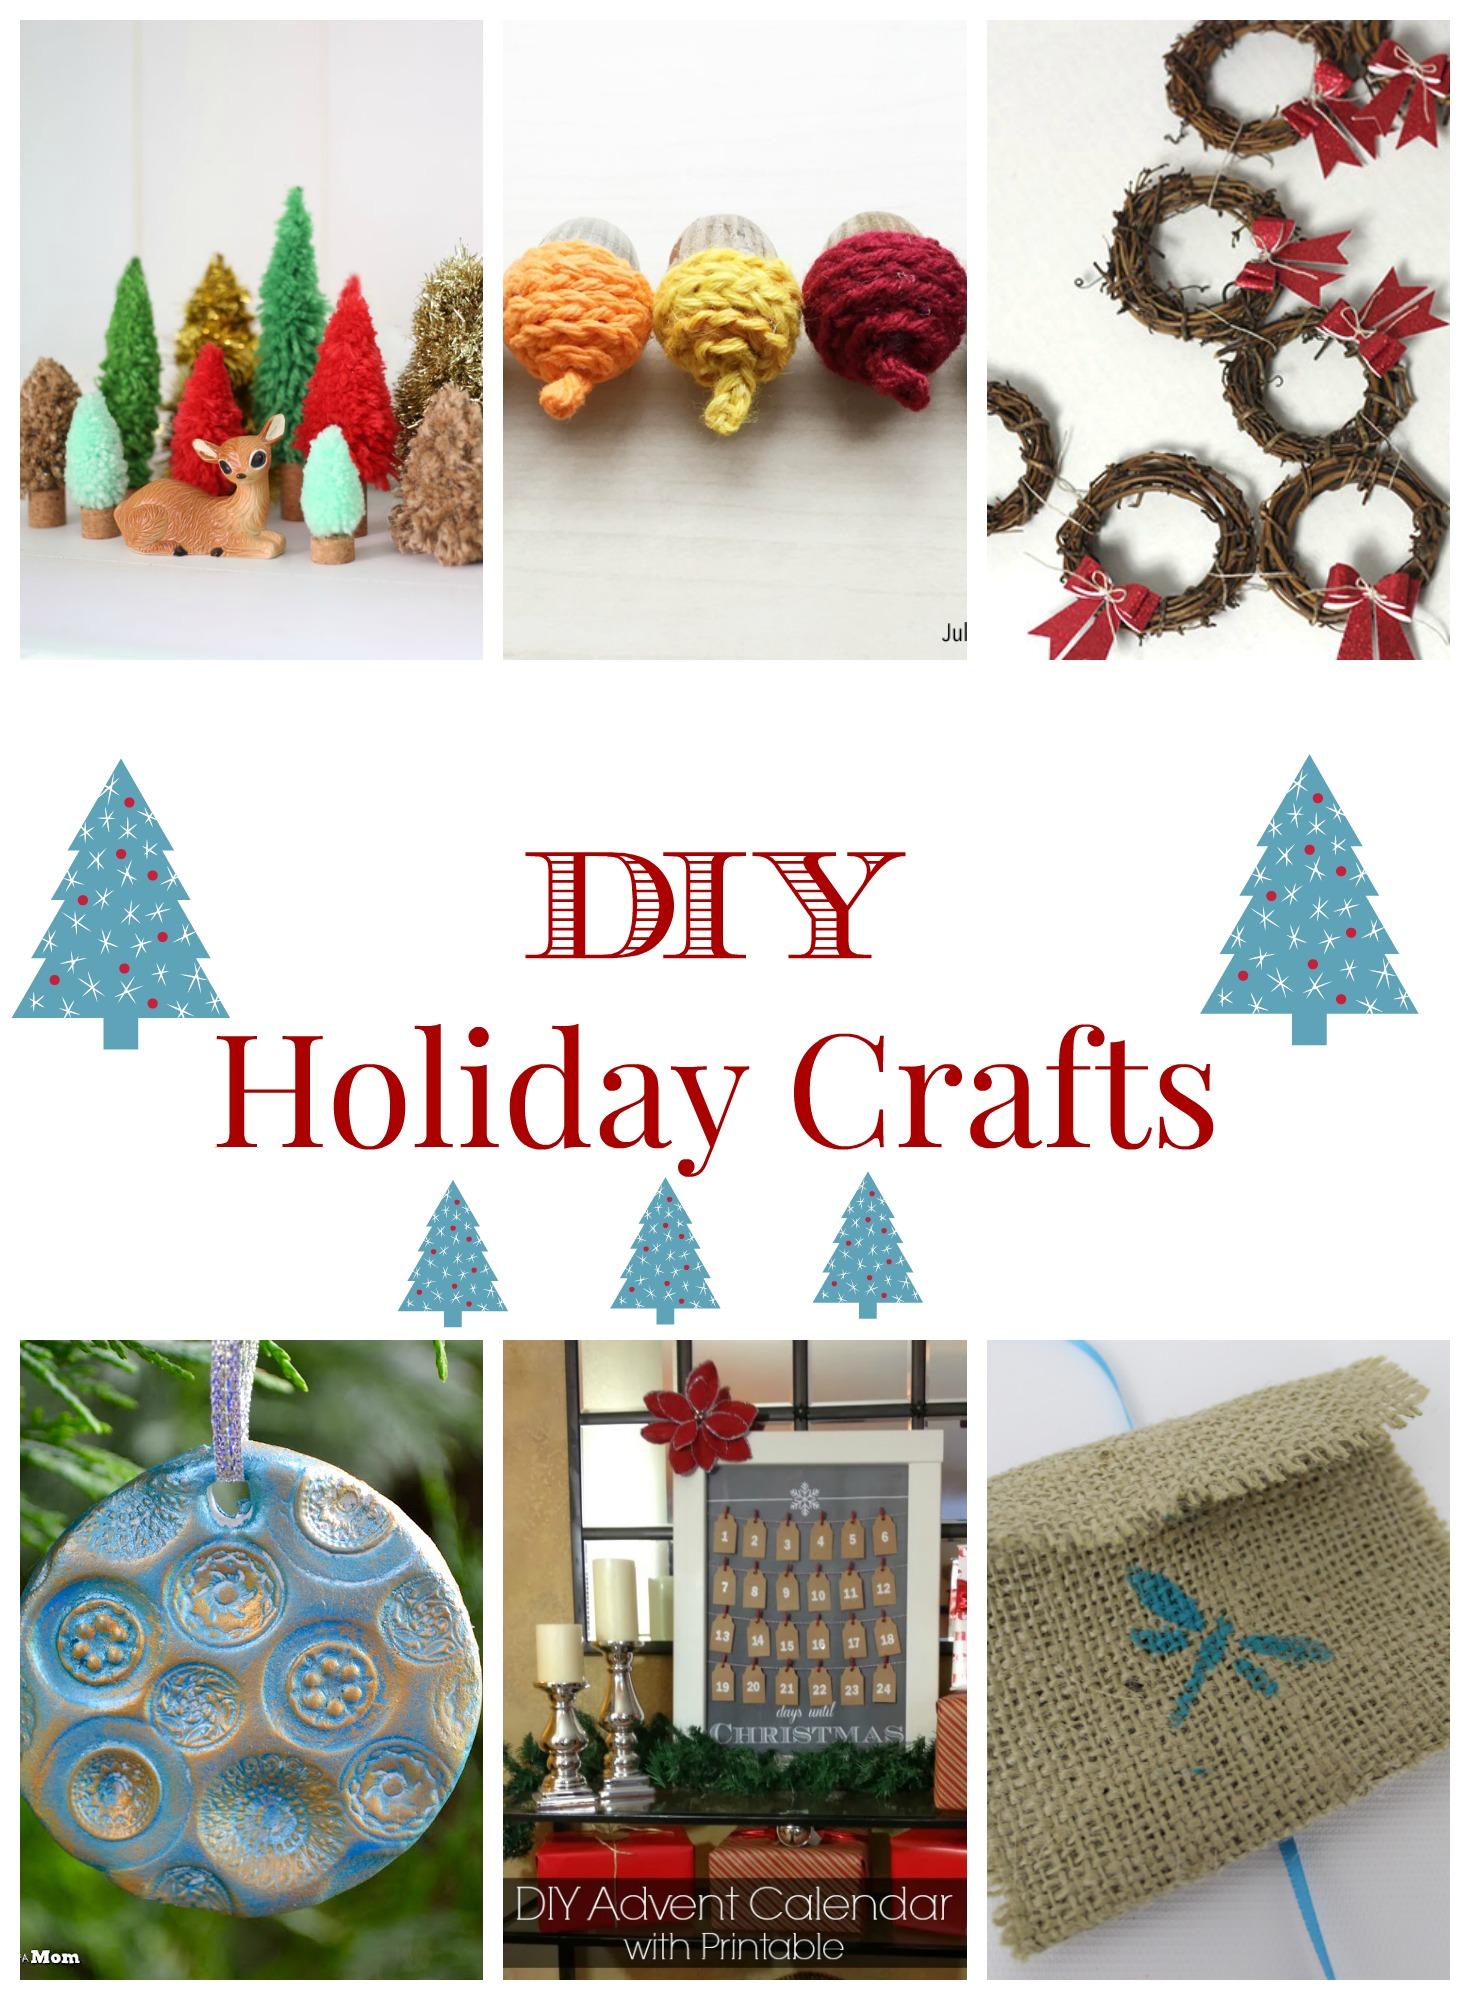 DIY Holiday Crafts You Can Make At Home